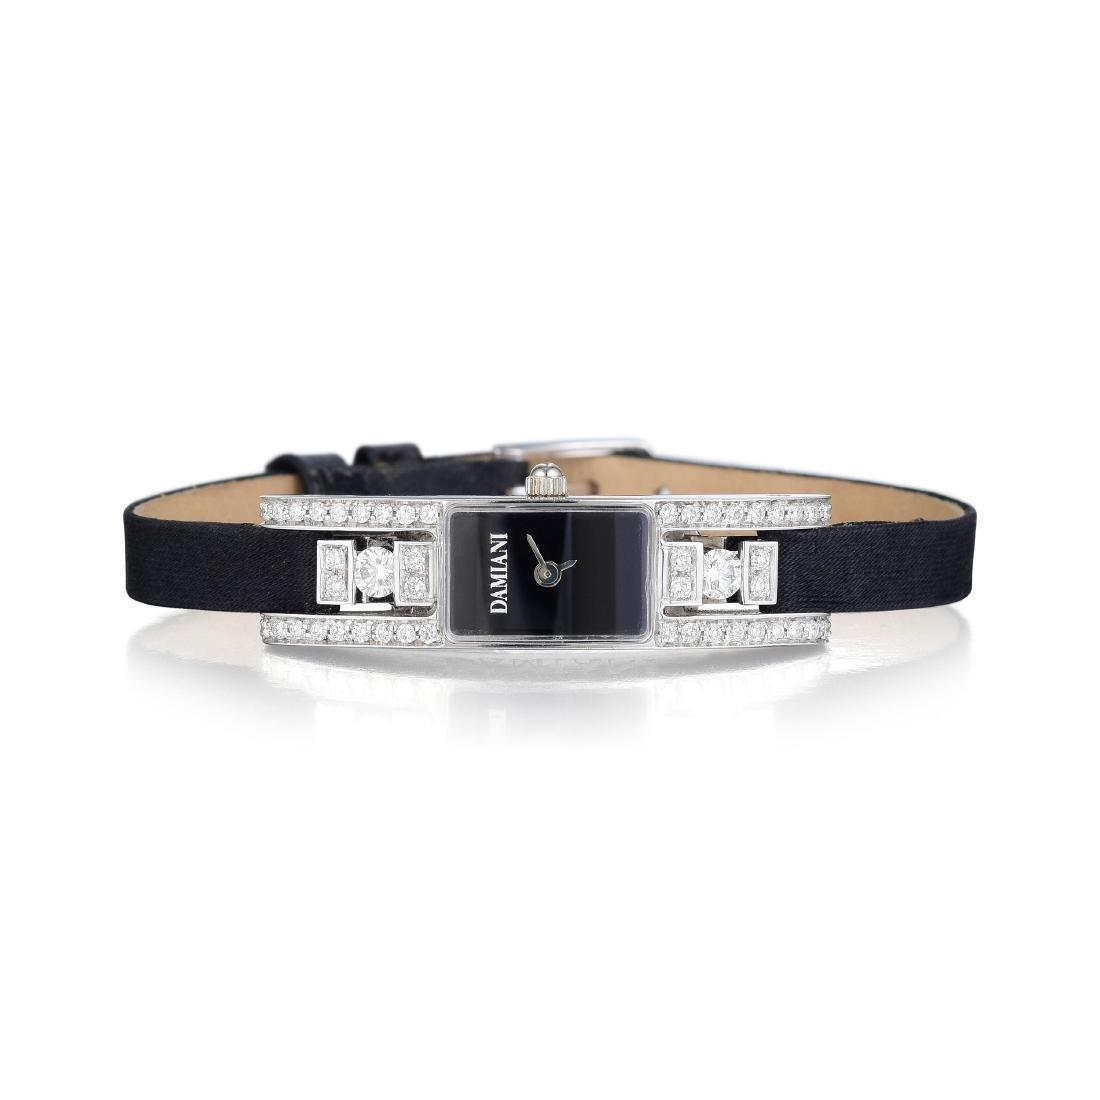 Damiani 18K White Gold and Diamond Ladies Watch